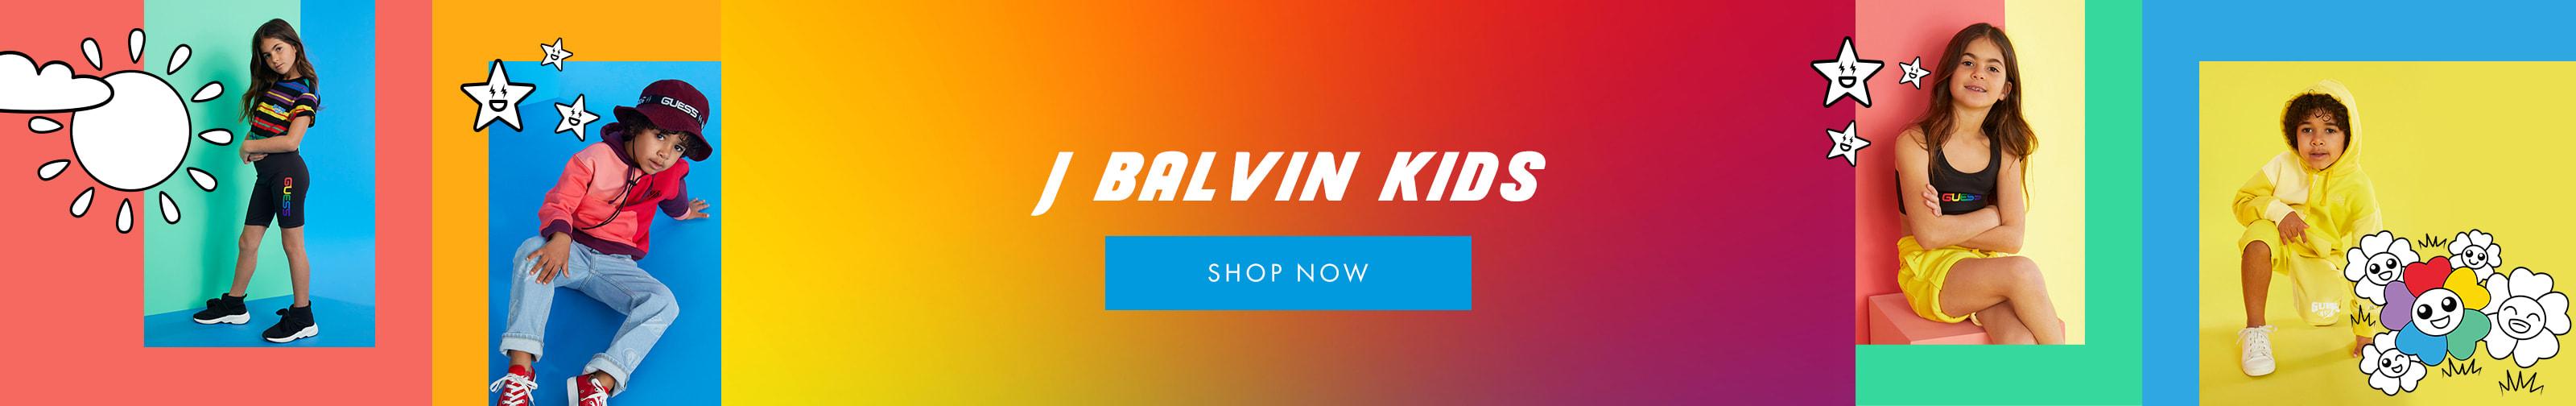 J Balvin Kids